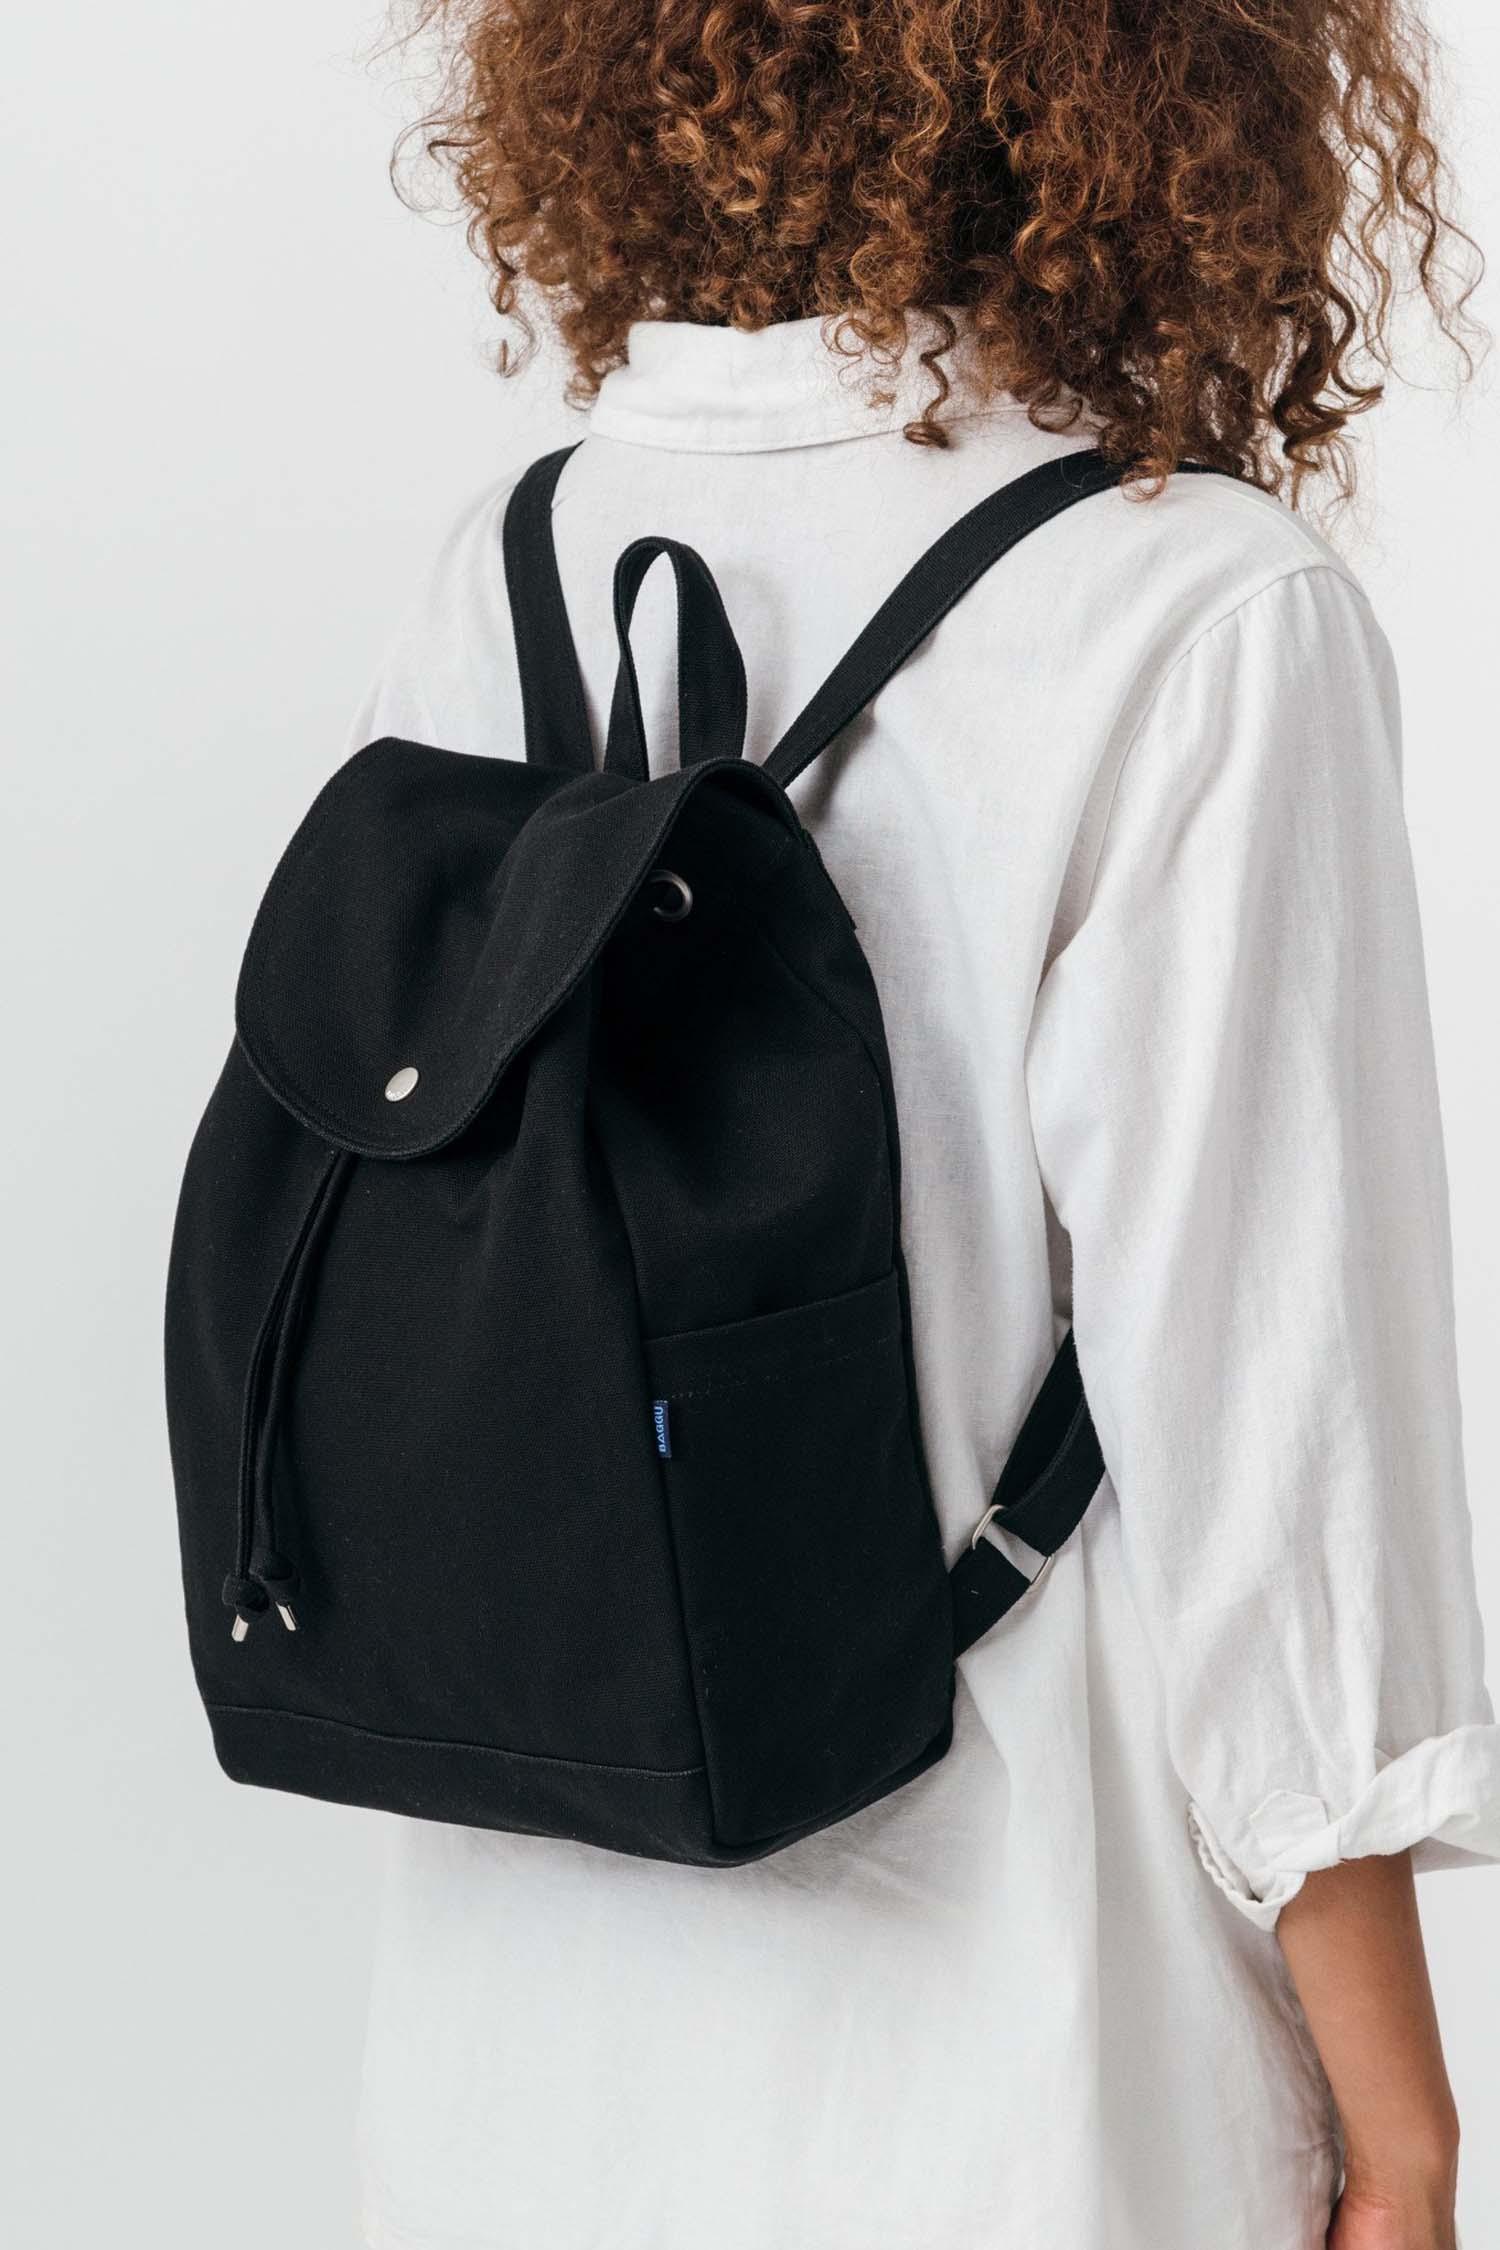 494a462b2 Baggu - Drawstring Backpack, Black, Marinsel Webshop